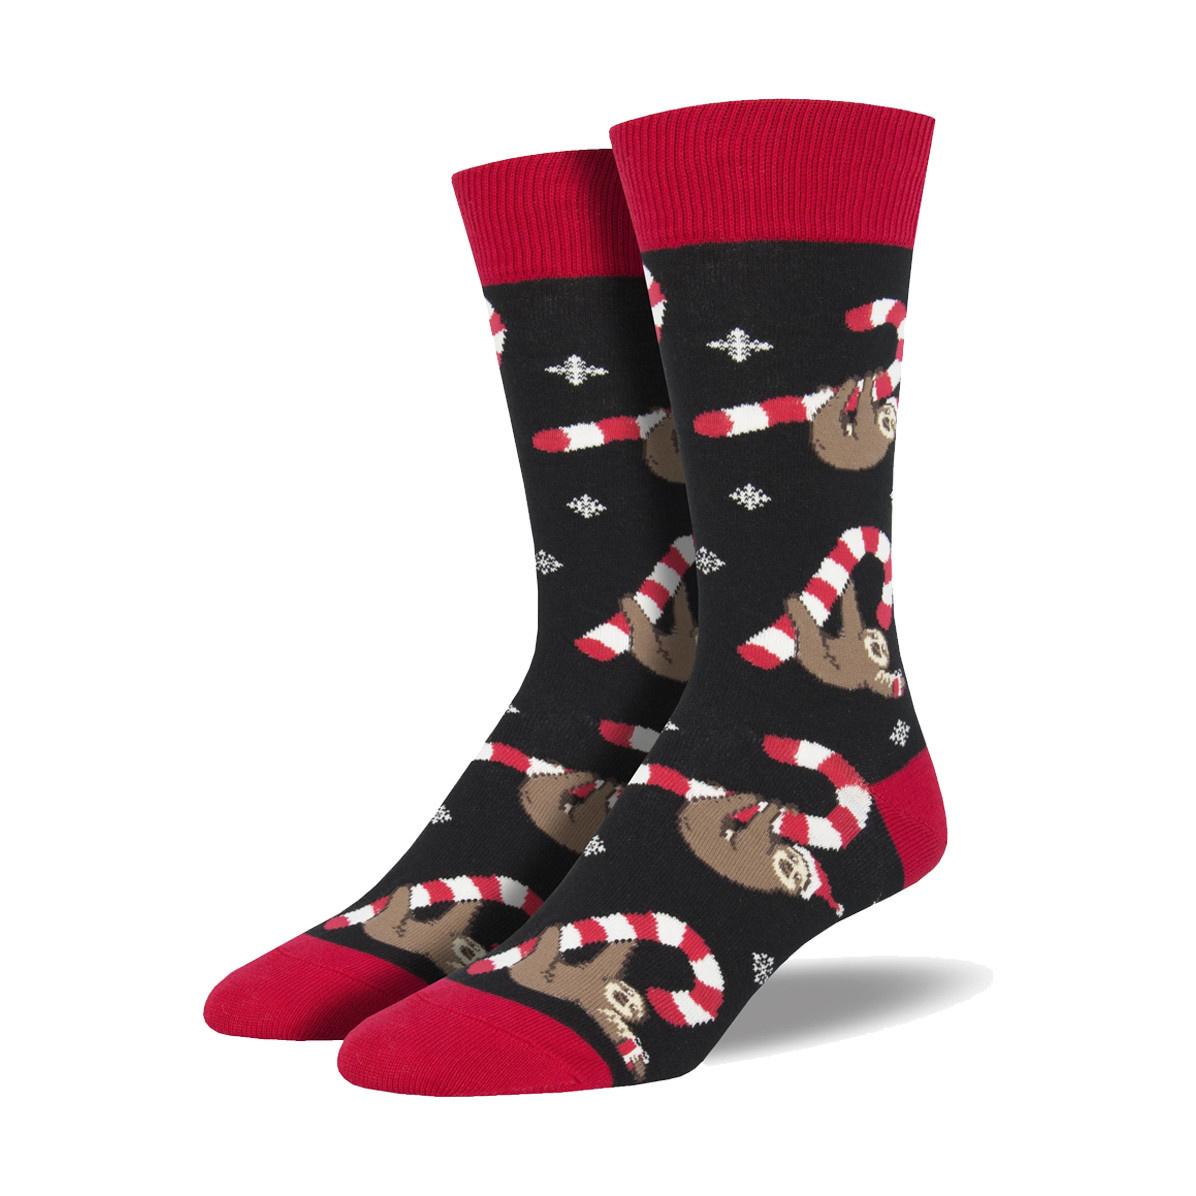 Socksmith Socksmith Men's Cotton Crew Socks Merry Slothmas